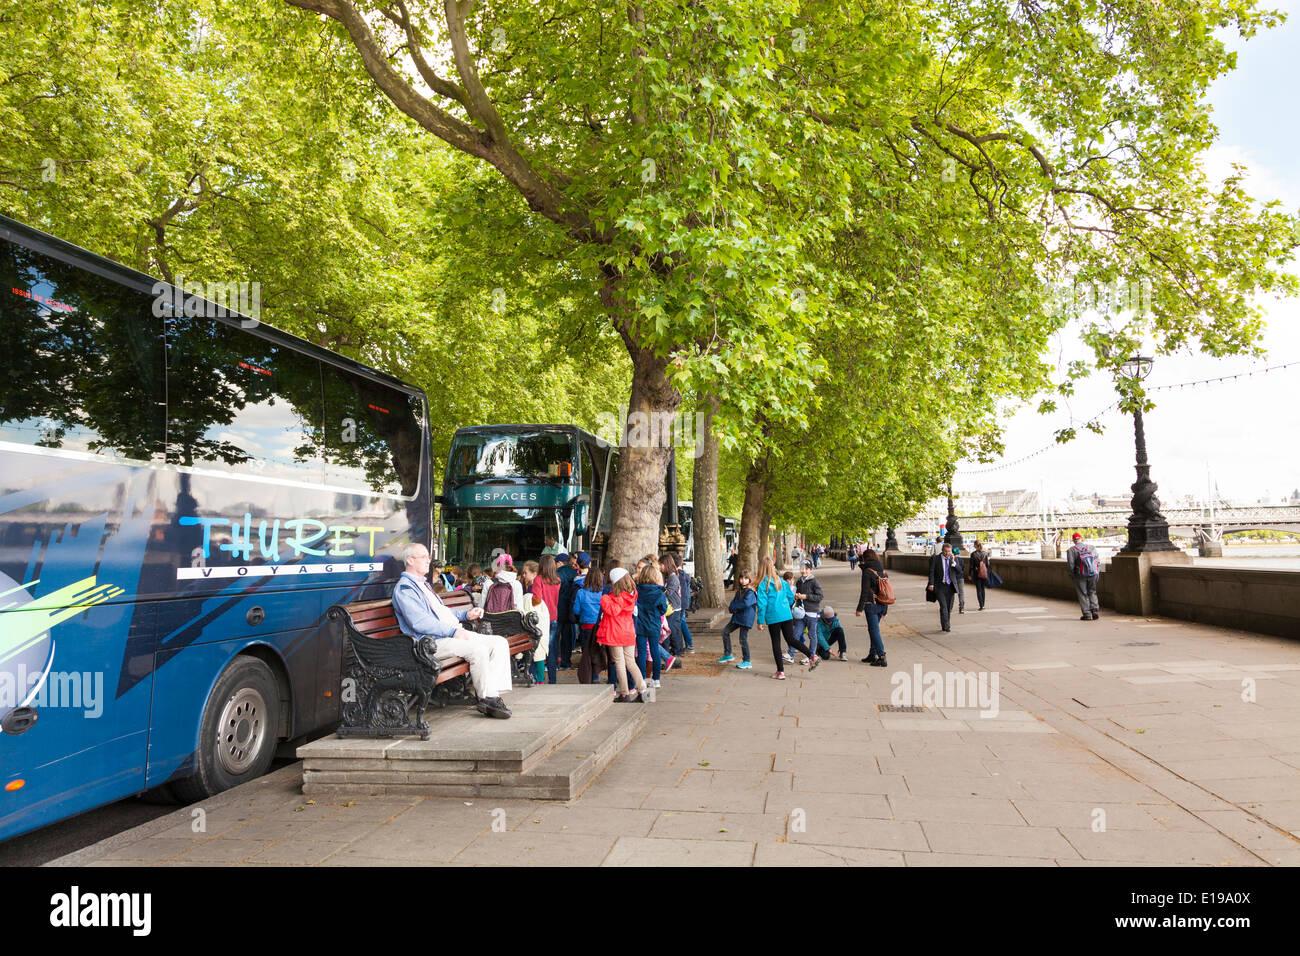 School age children boarding tourists coaches on Victoria Embankment London. - Stock Image